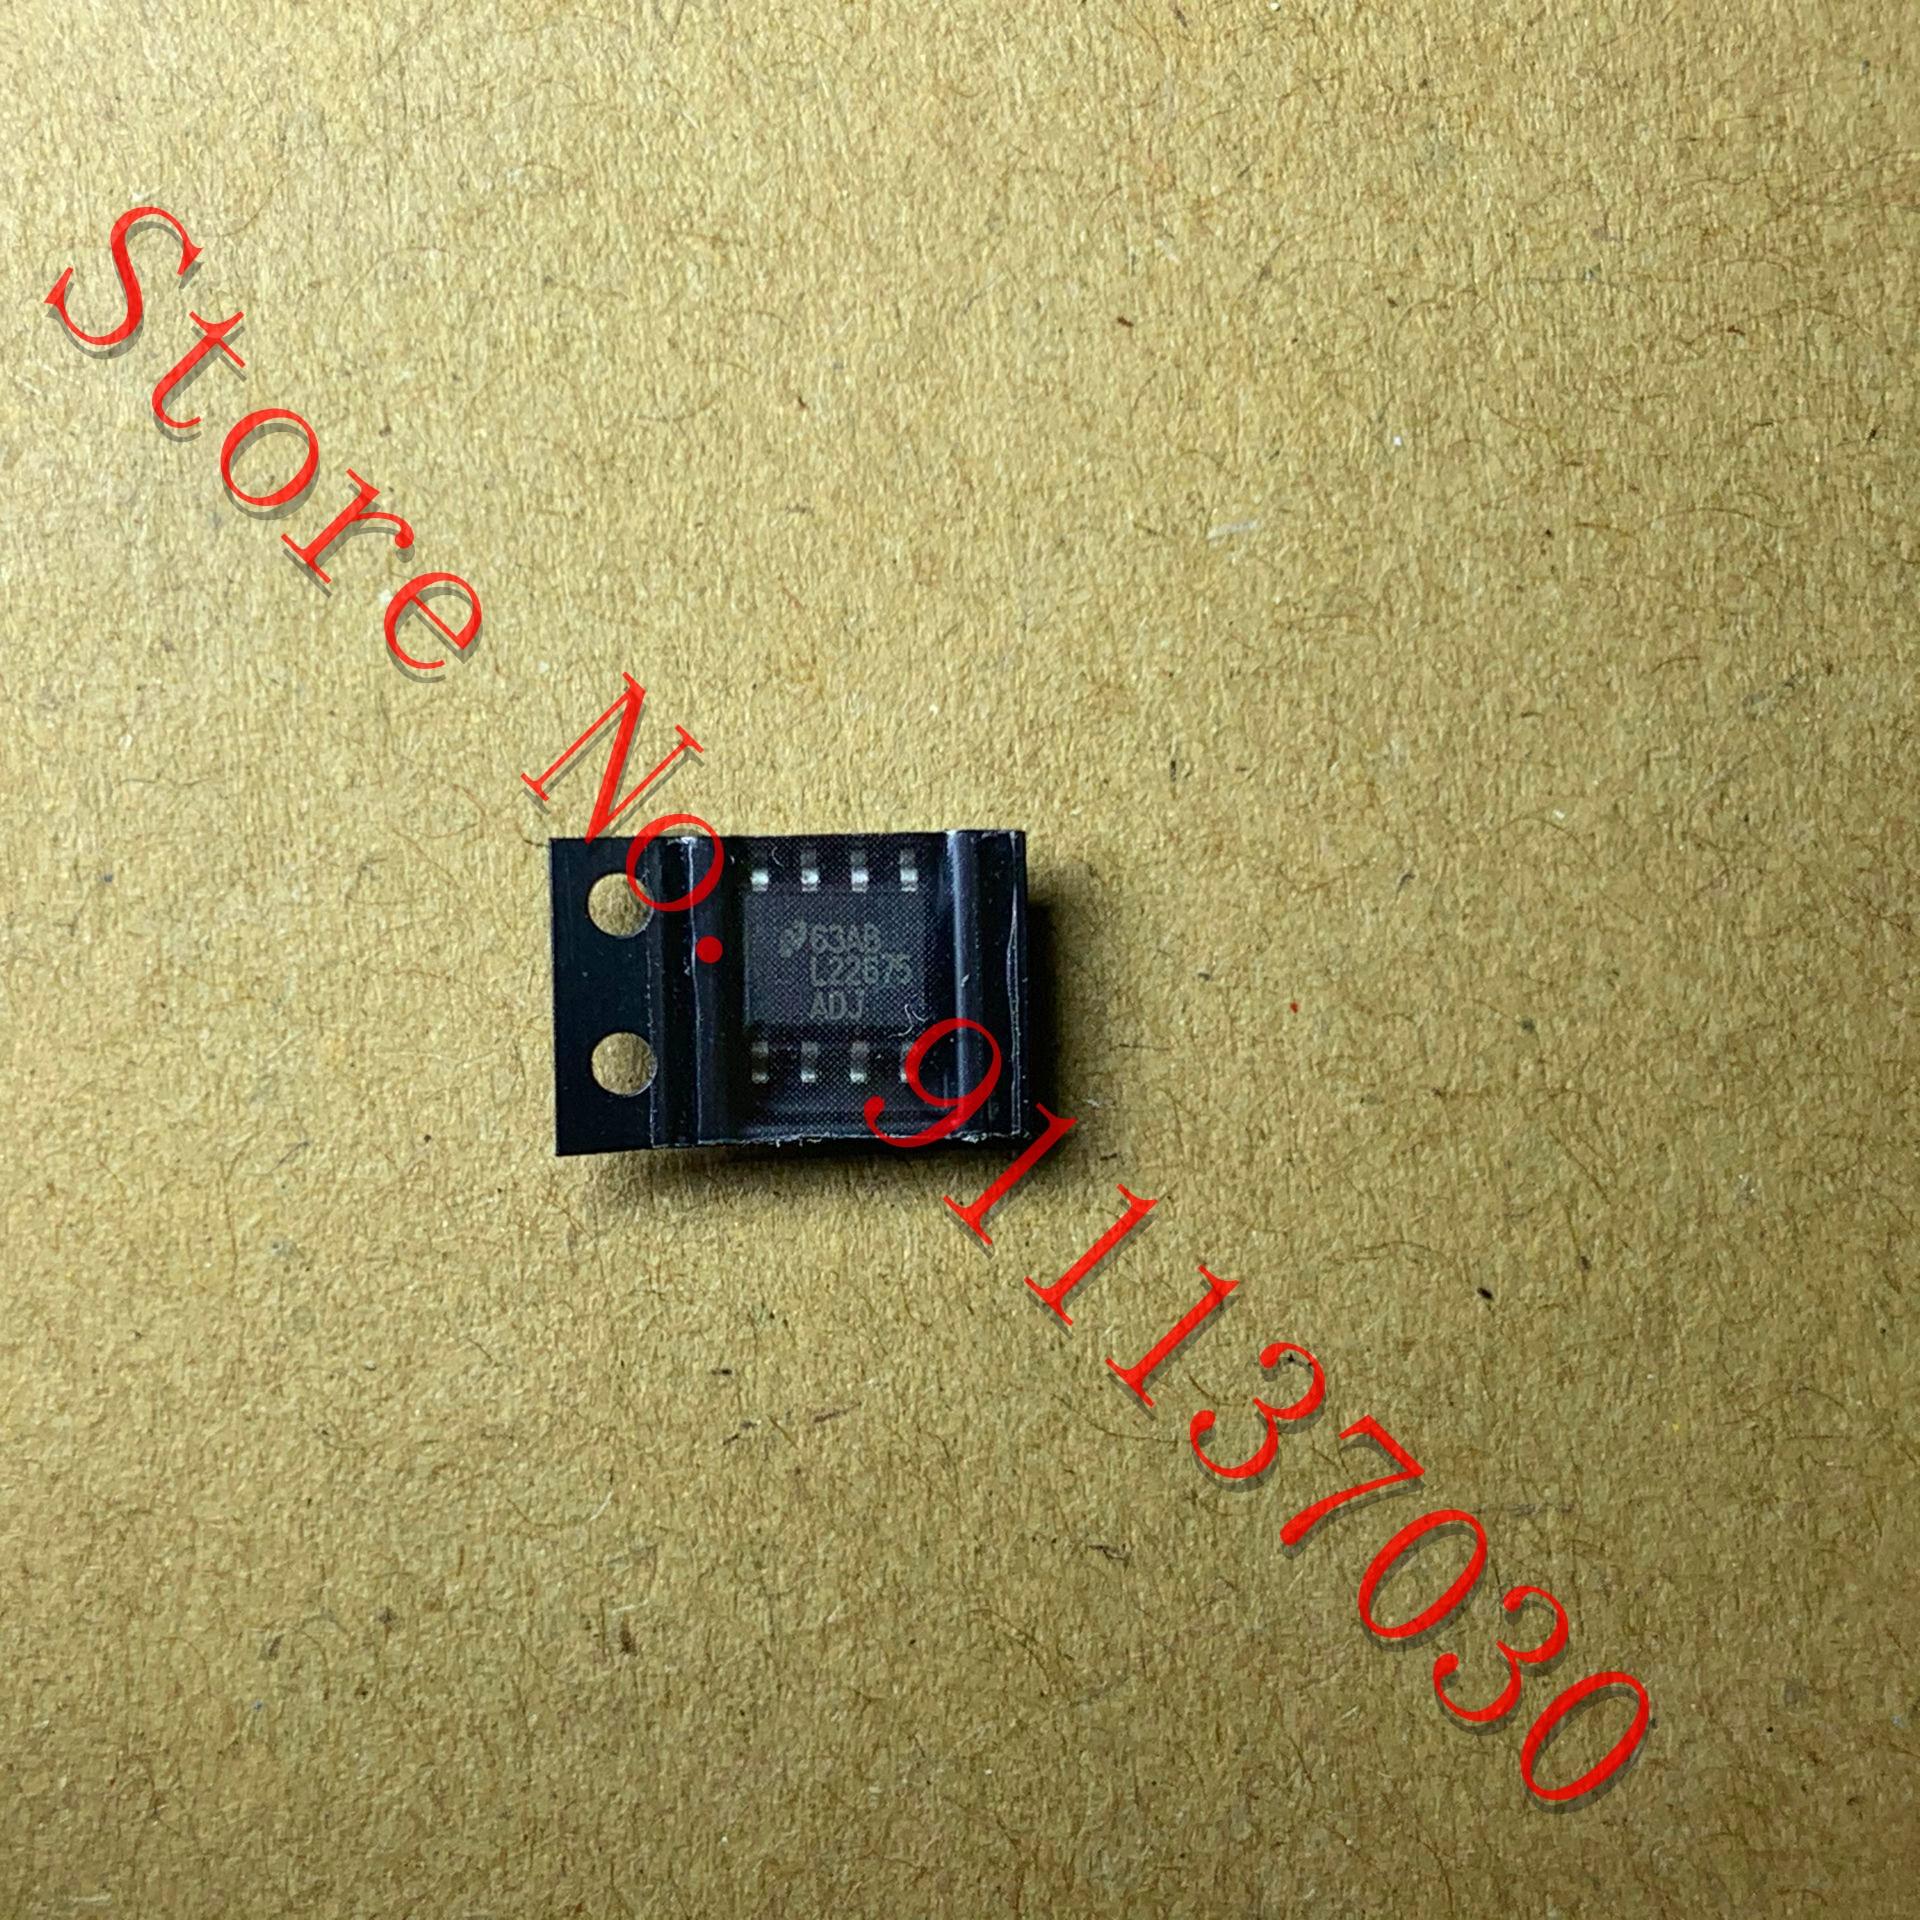 1 pcs/lot LM22675 LM22675MR-ADJ SOP8